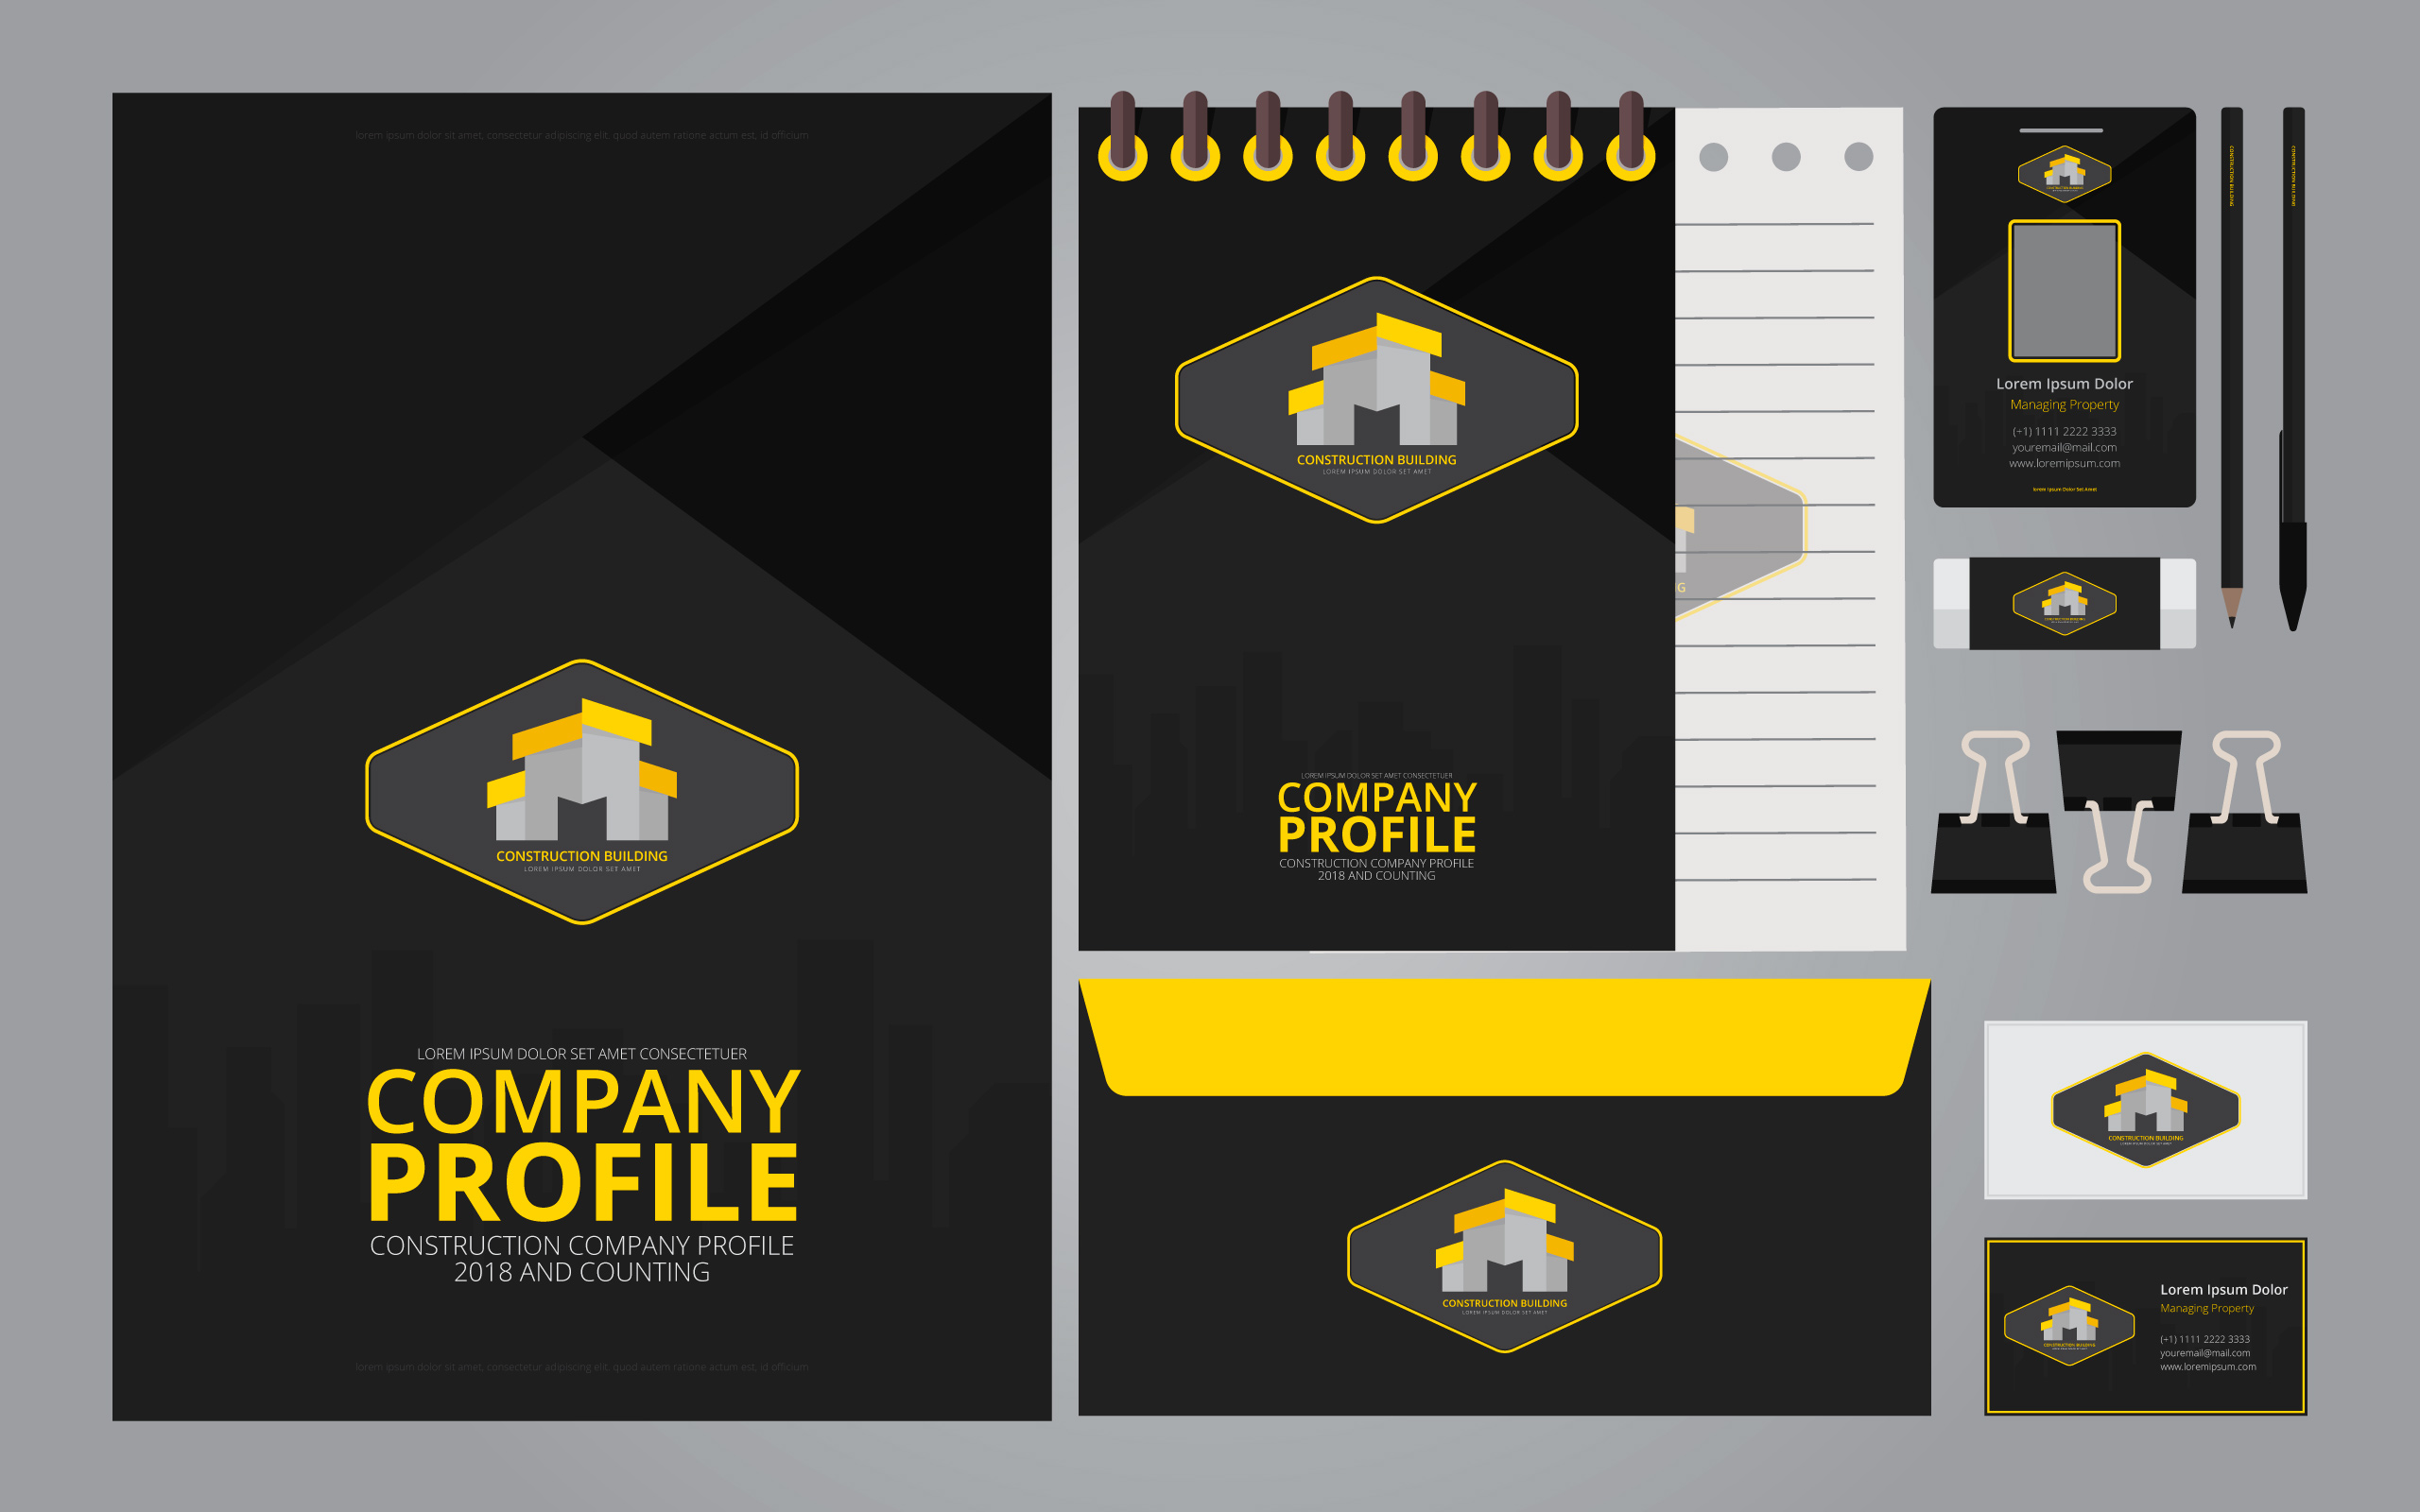 2560x1600 Company Profile Template Free Vector Art